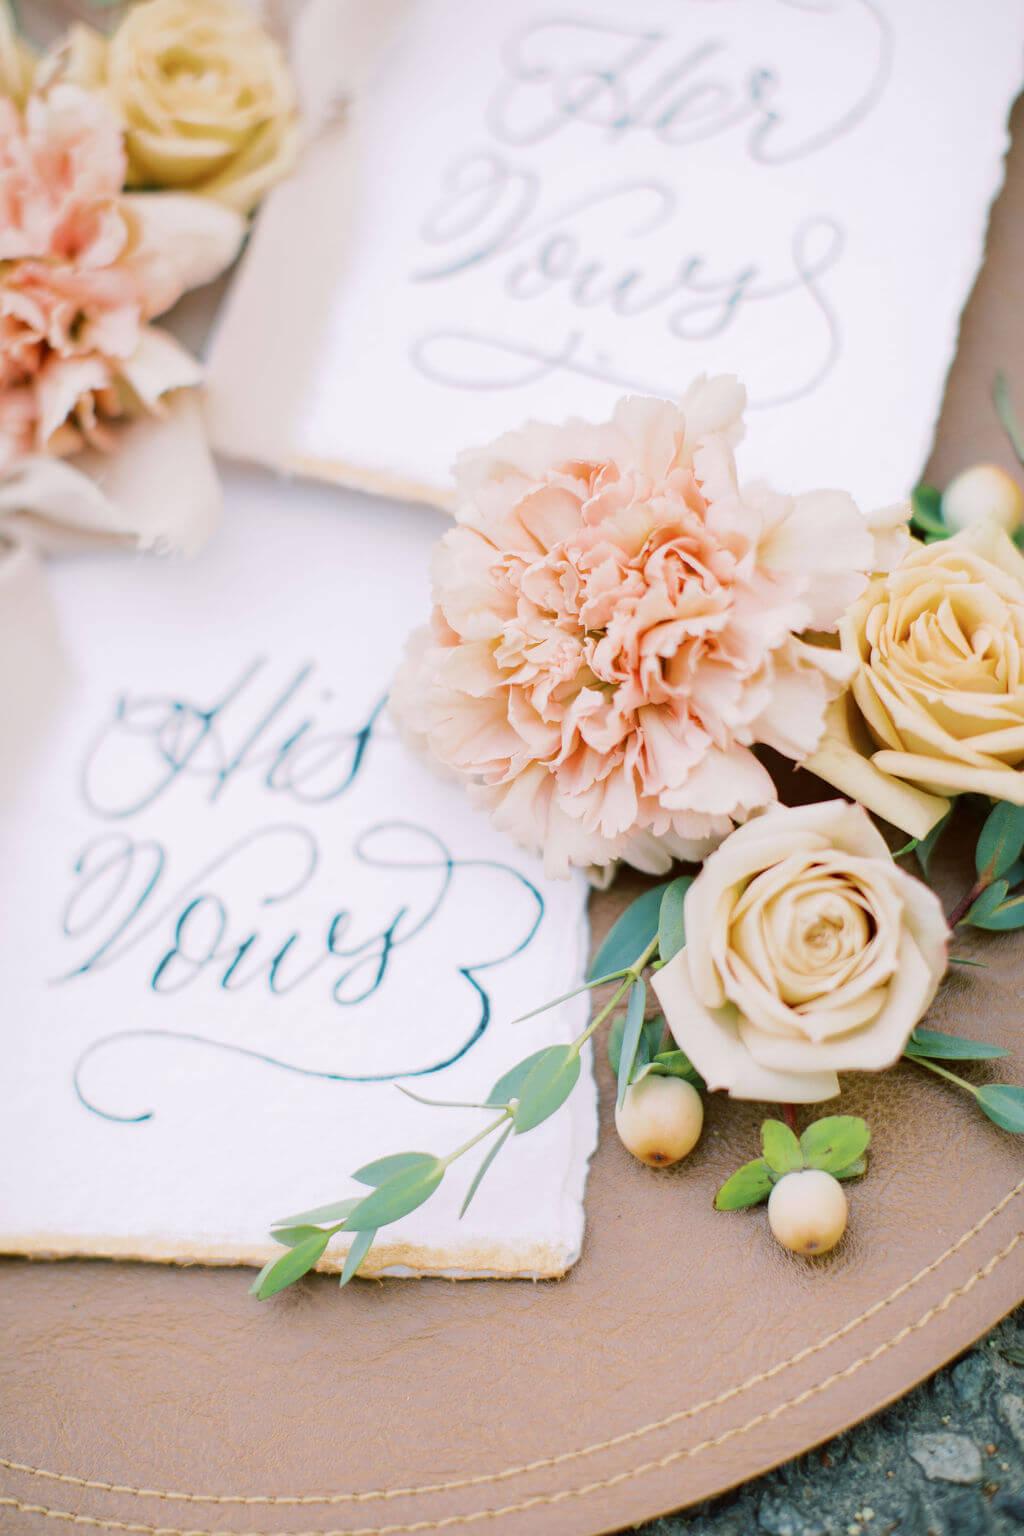 h & l lovely creations bespoke weddings southern california greenhouse elopment 00001